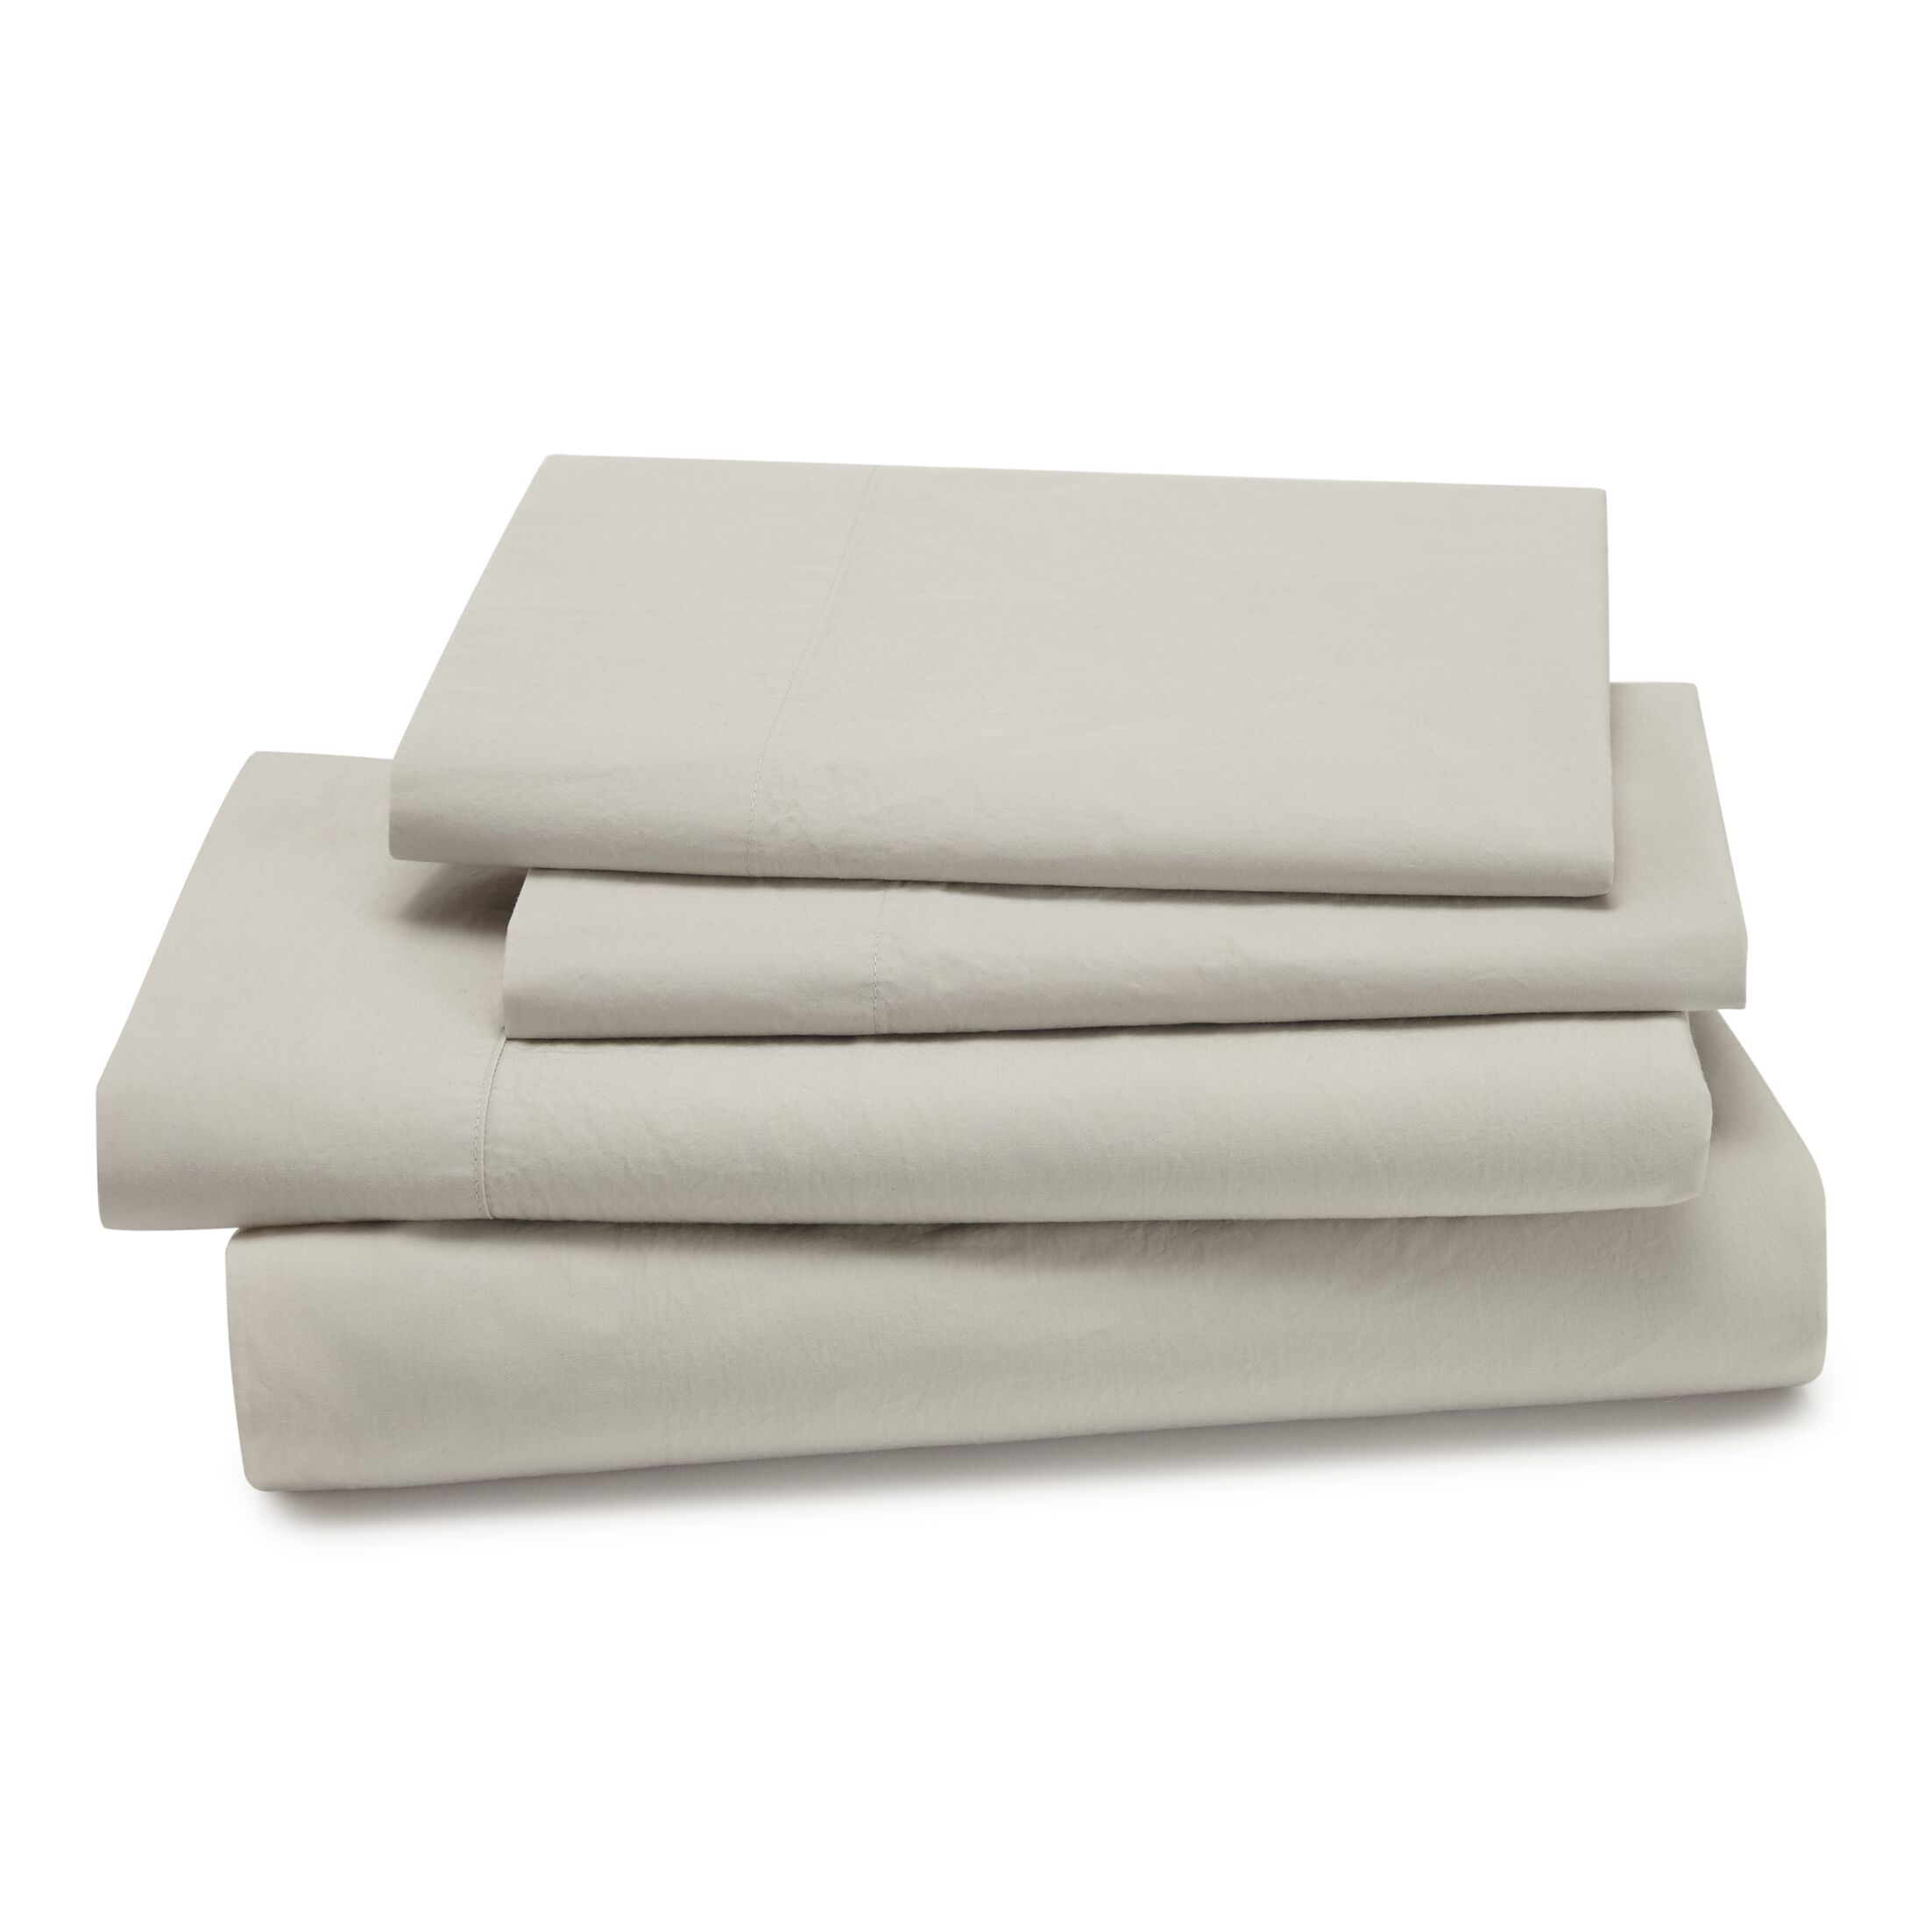 Lorimer 300 Thread Count Sheet Set Color: Oatmeal, Size: Twin